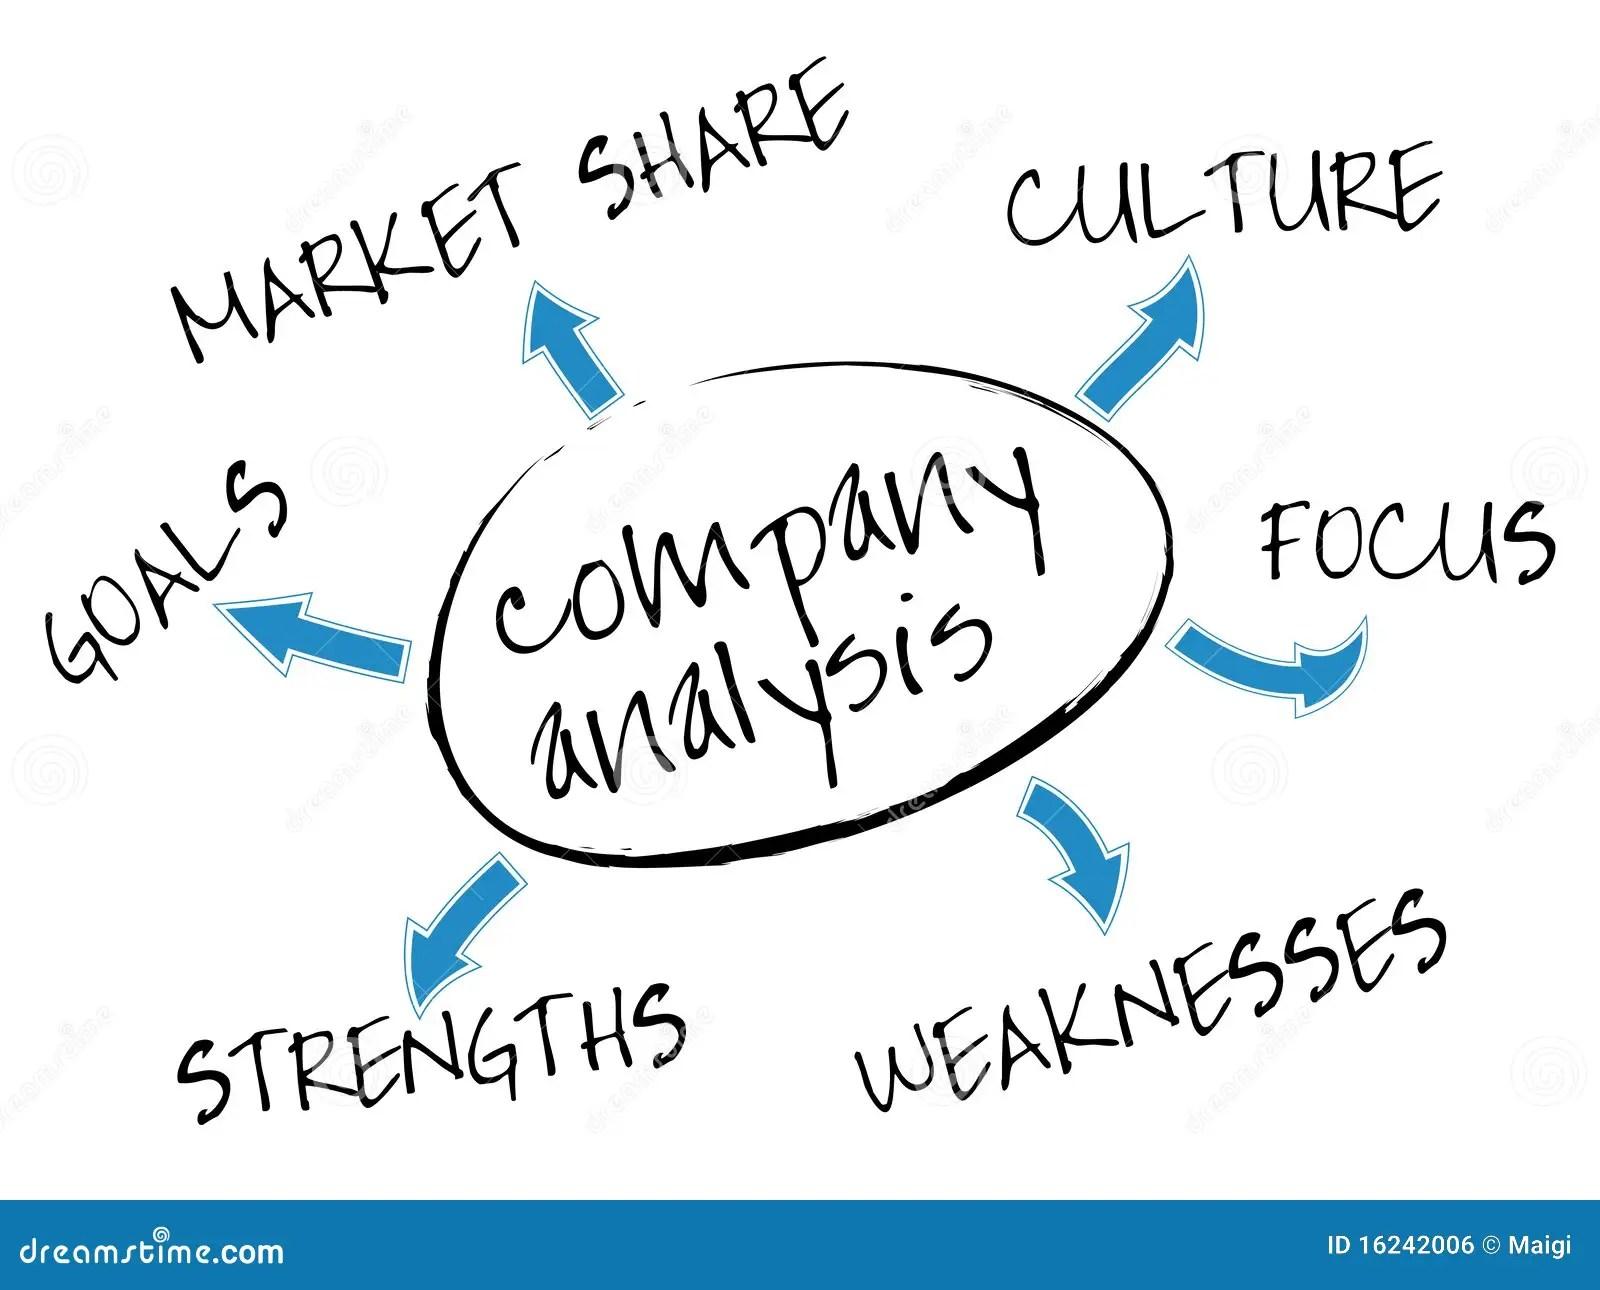 Company analysis chart stock illustration. Image of